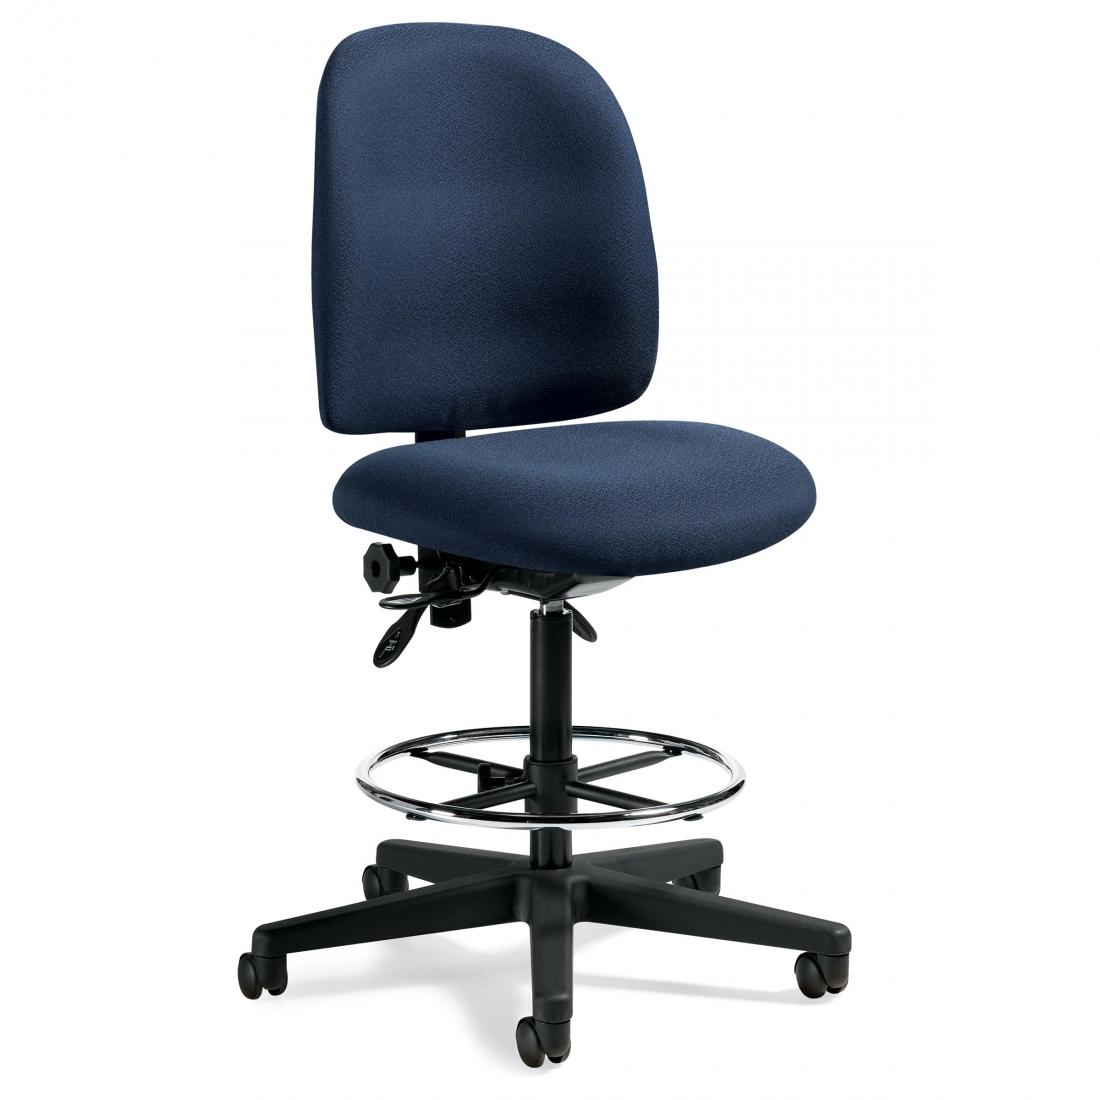 Global Corporate Furniture Group Cfg